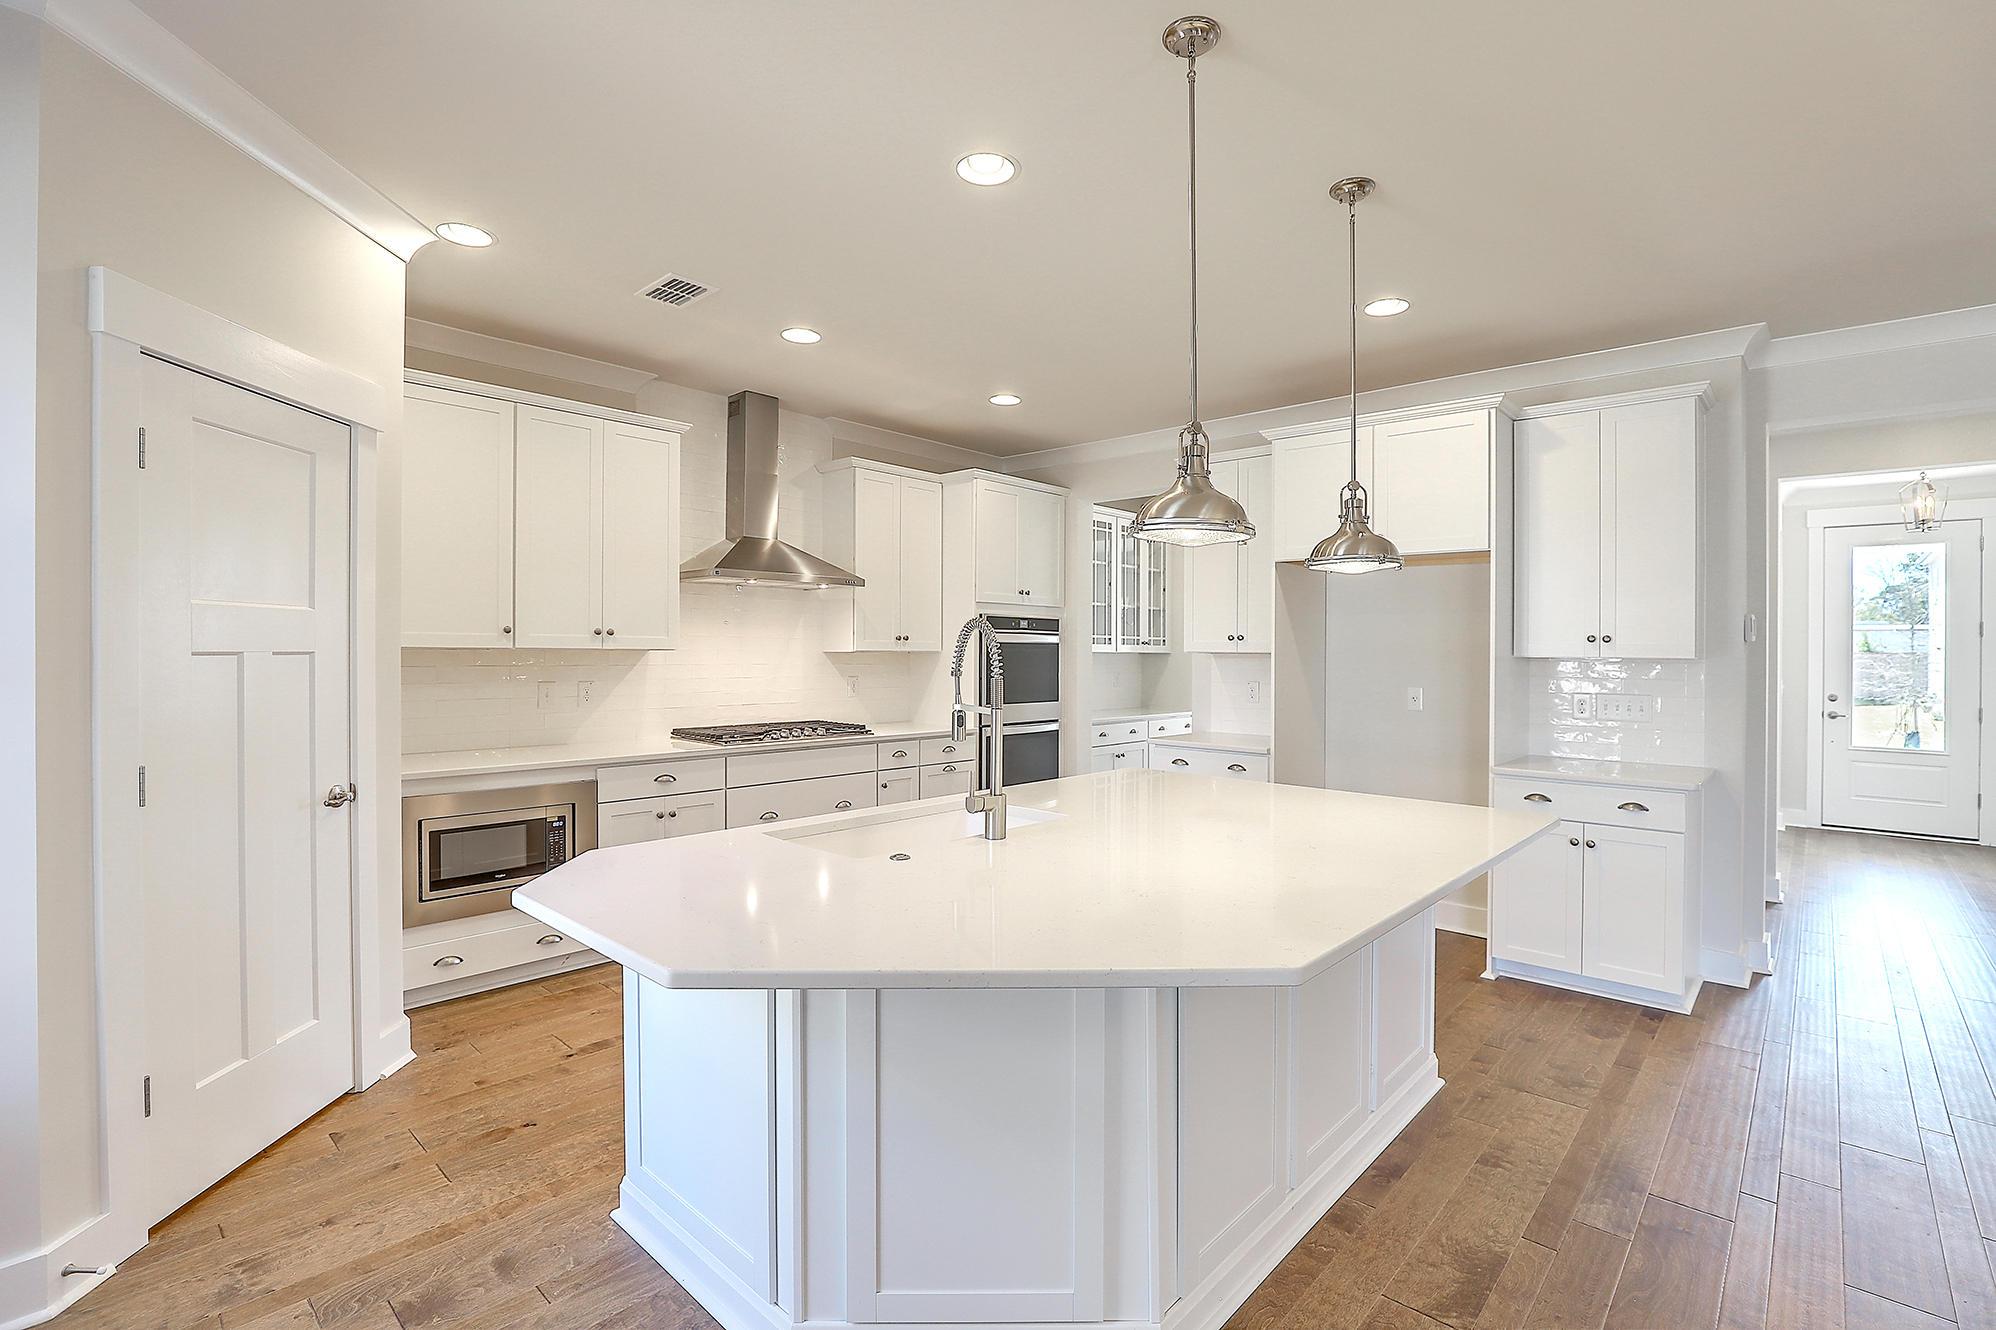 Bentley Park Homes For Sale - 1218 Gannett, Mount Pleasant, SC - 5